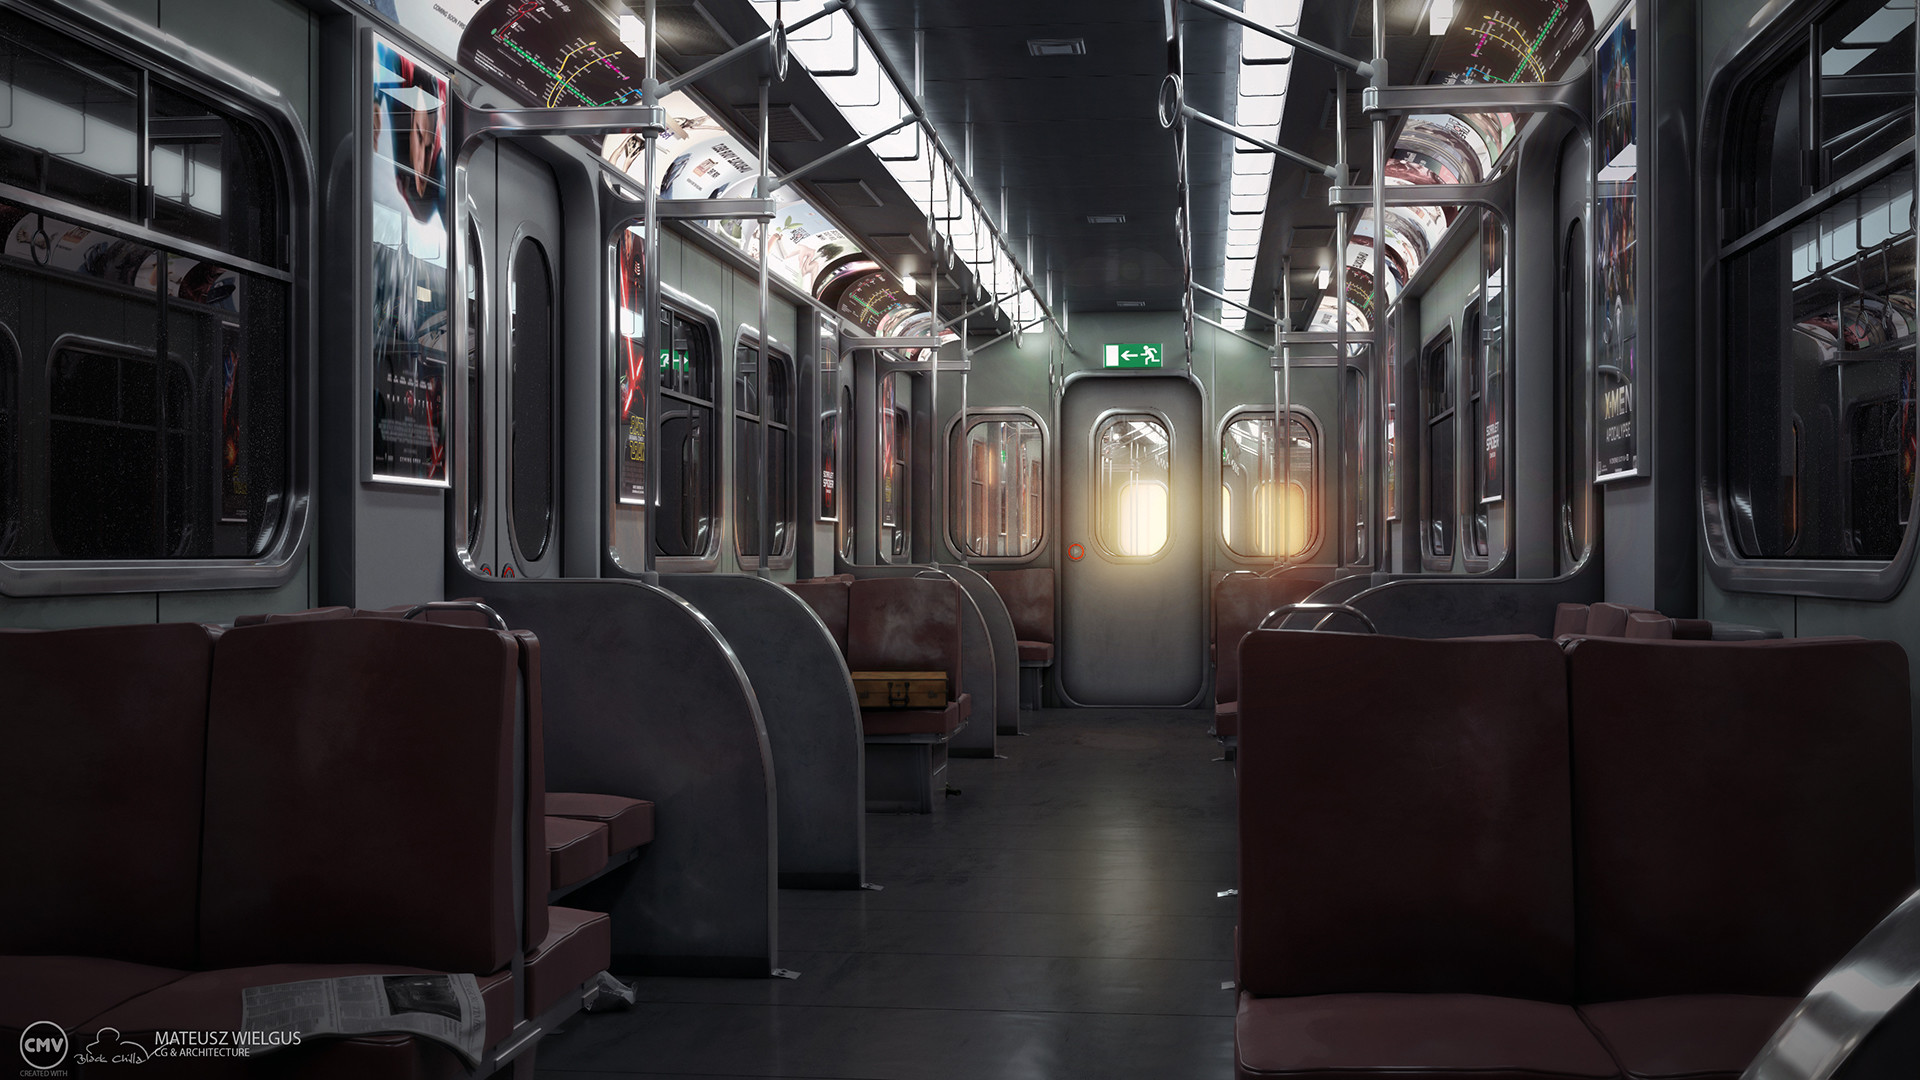 Mateusz wielgus grim train 2k